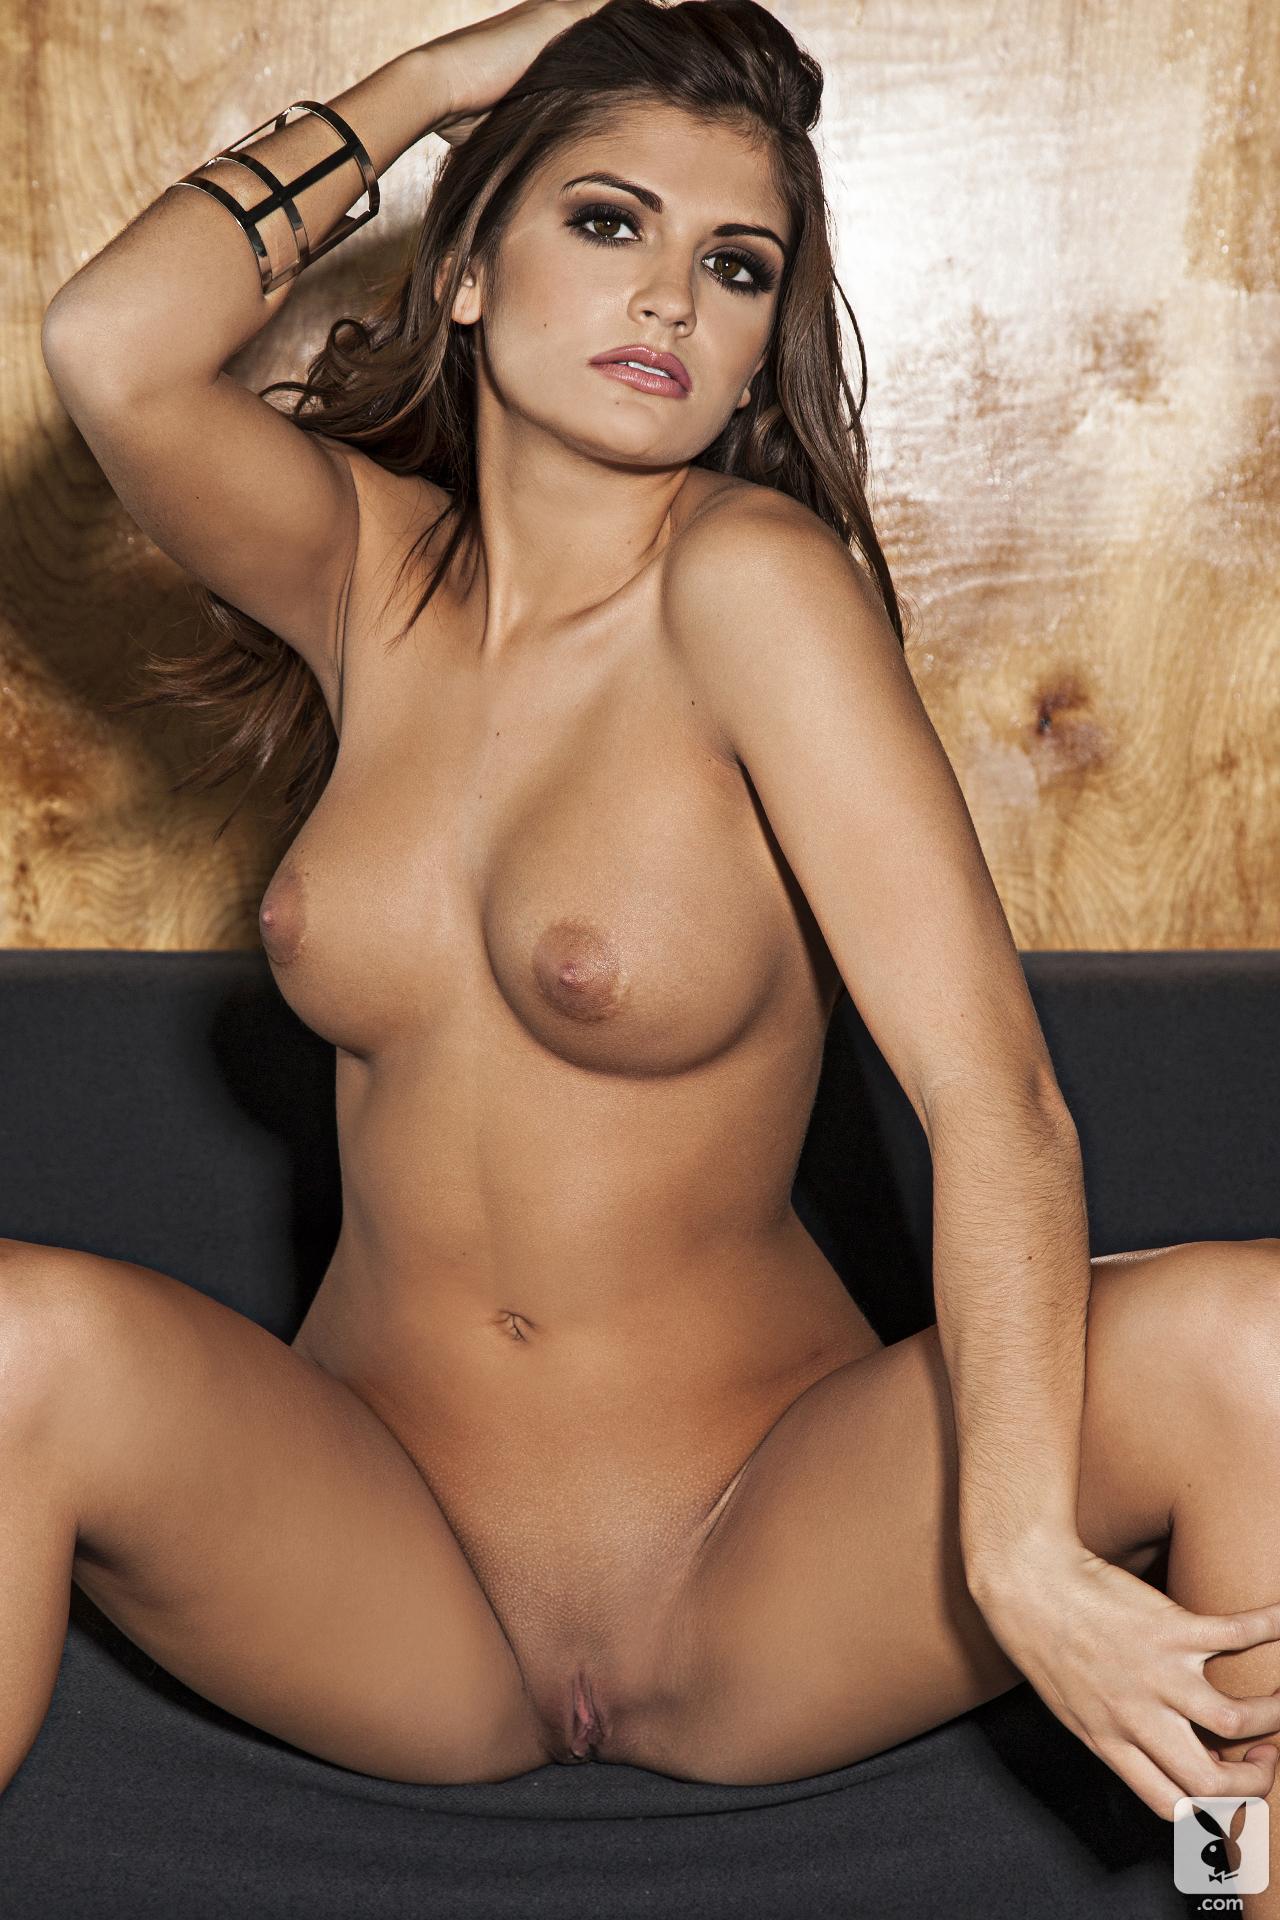 Rebecca carter nude